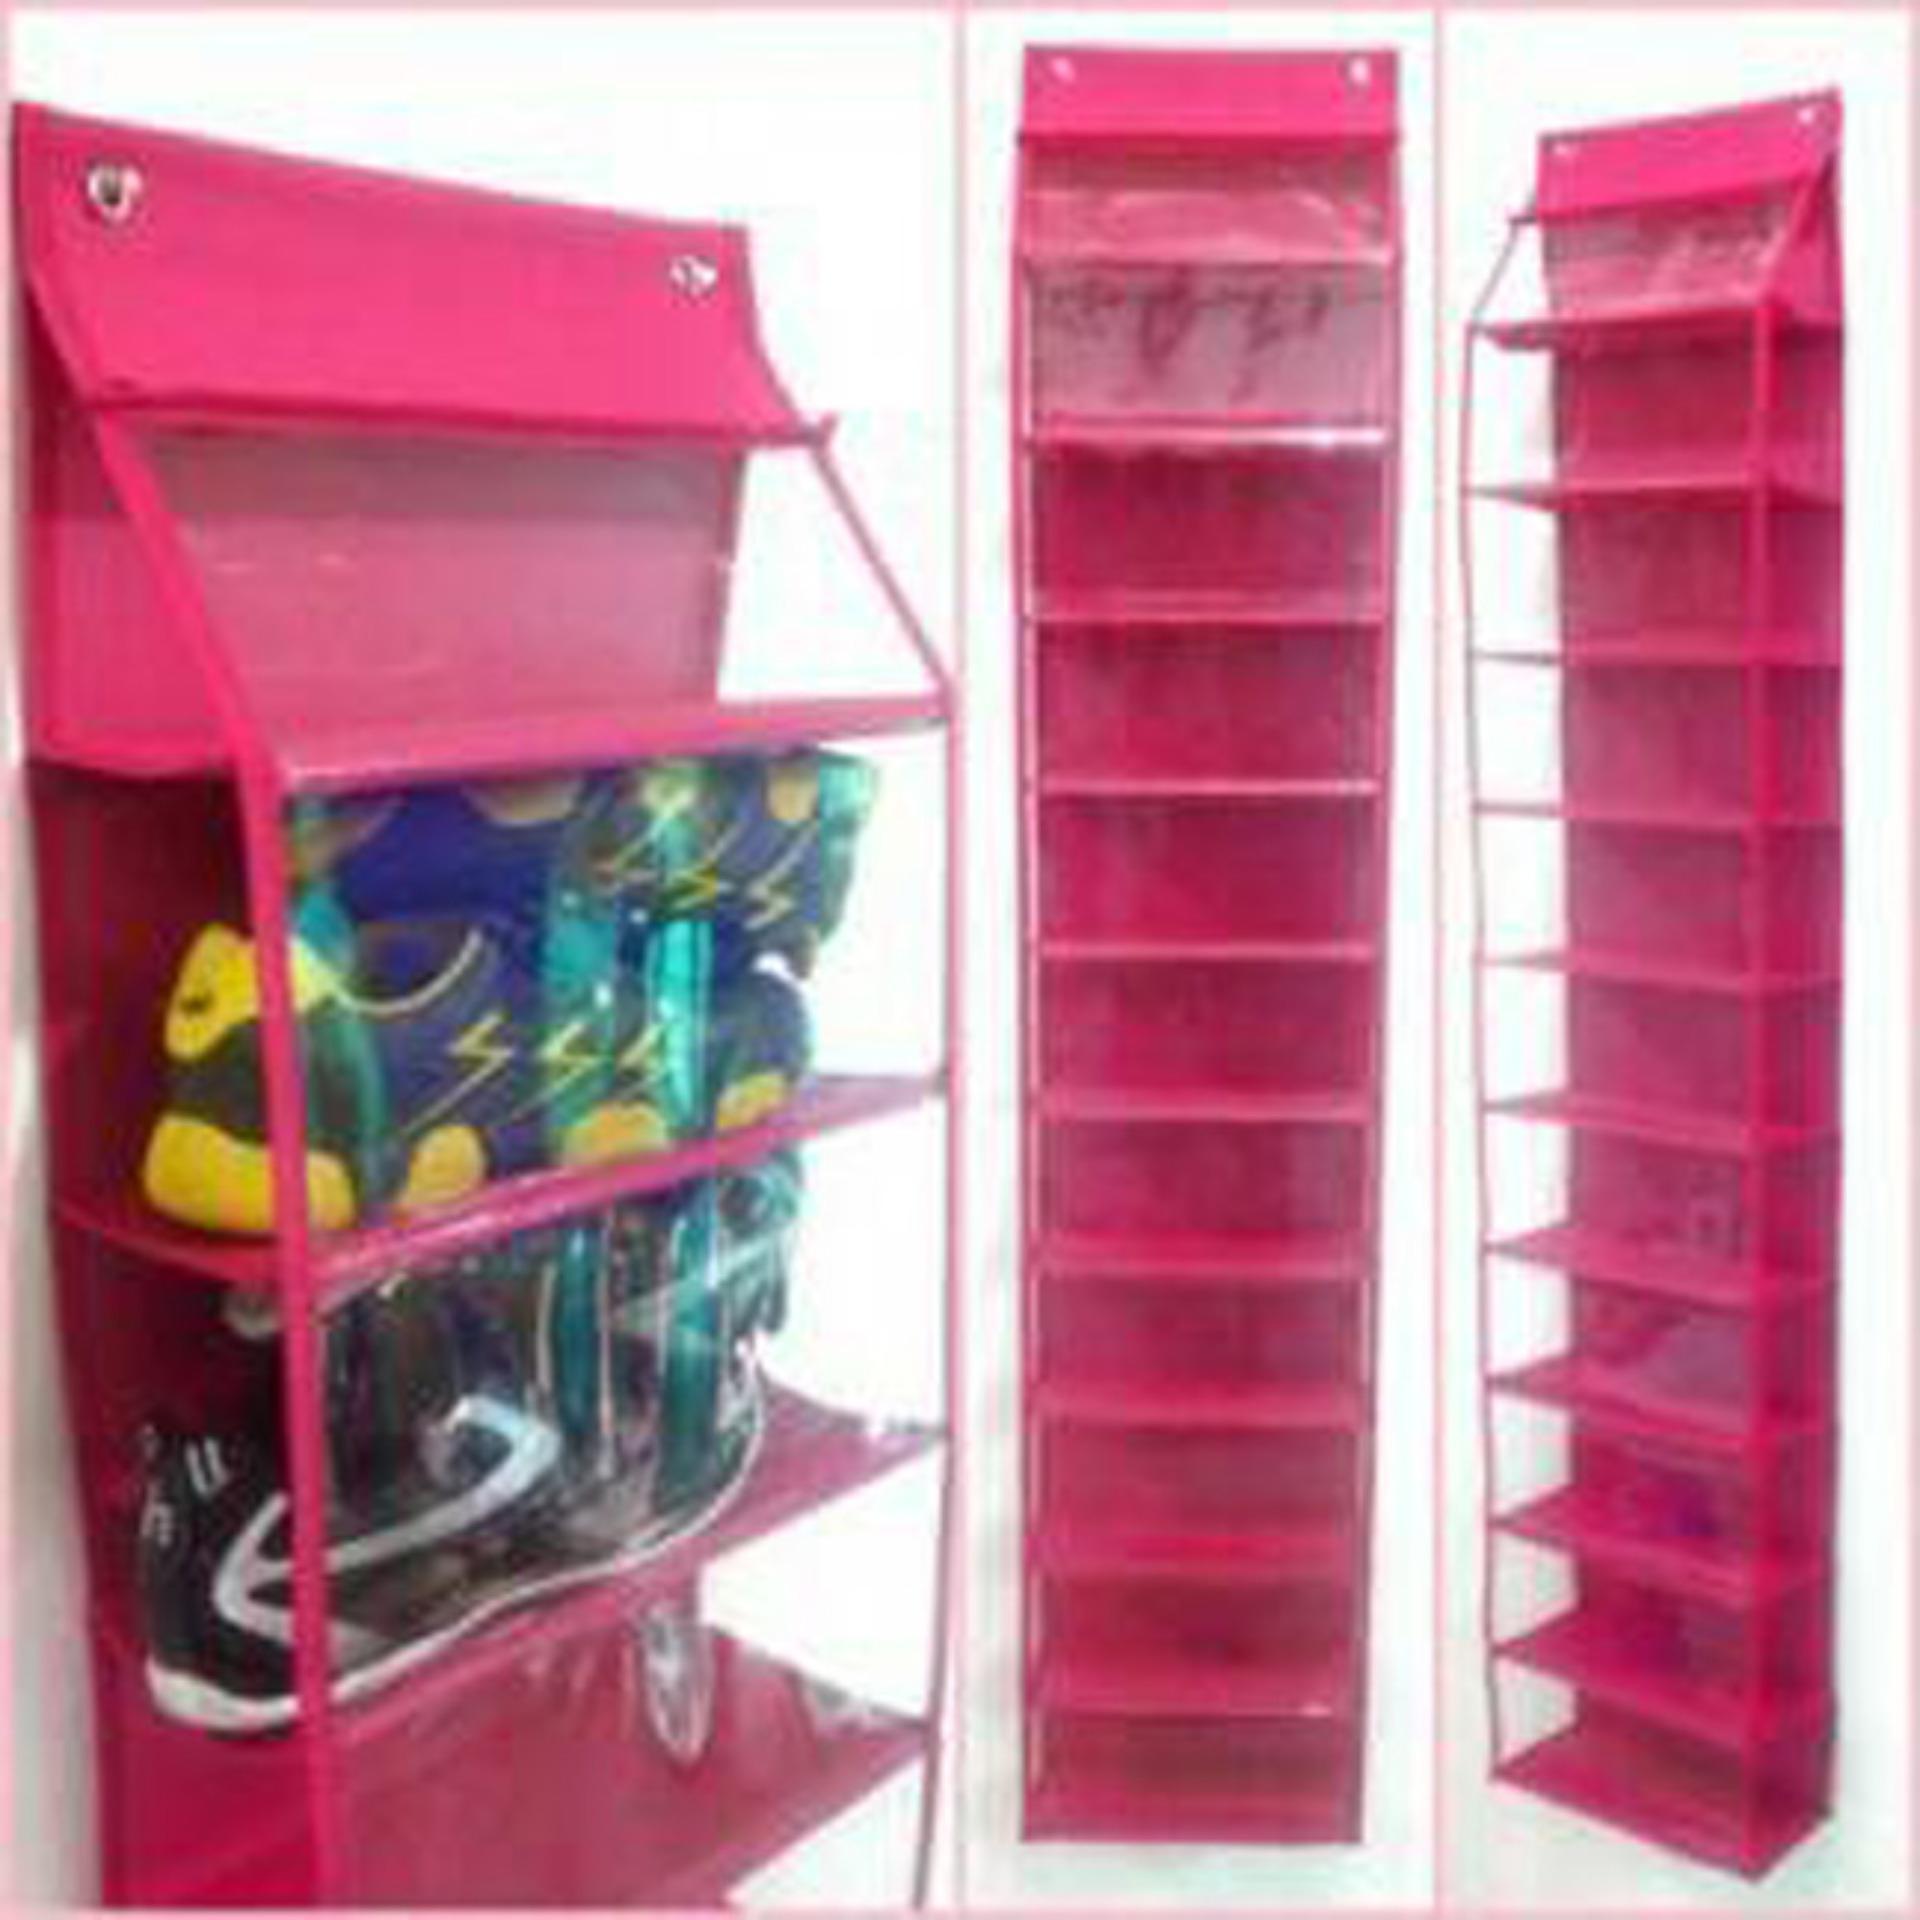 Jual Emwe Hso Rak Sepatu Gantung Terbuka Tanpa Resleting Hanging Shoes Organizer No Zipper 11 Sekat Shoe Case Sandal Hot Pink Original